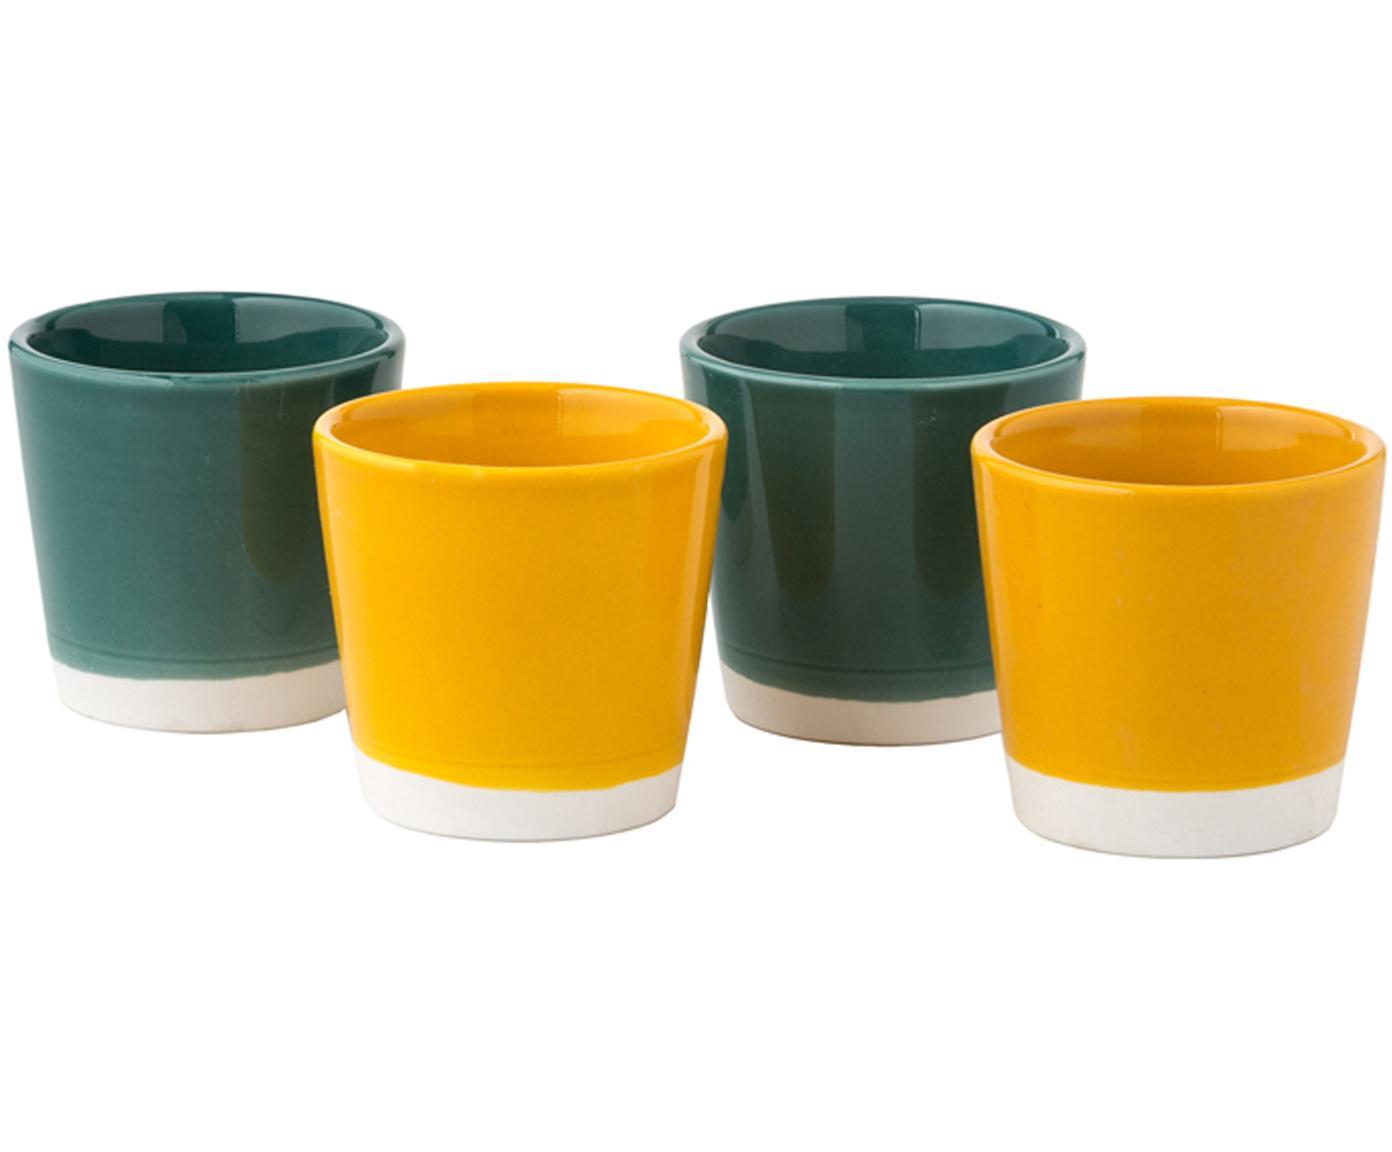 Set tazze da caffè Yen, 4 pz., Pietra arenaria, Tazze 1 e 2: bianco, verde Tazze 3 e 4: bianco, giallo, Ø 7 x A 6 cm